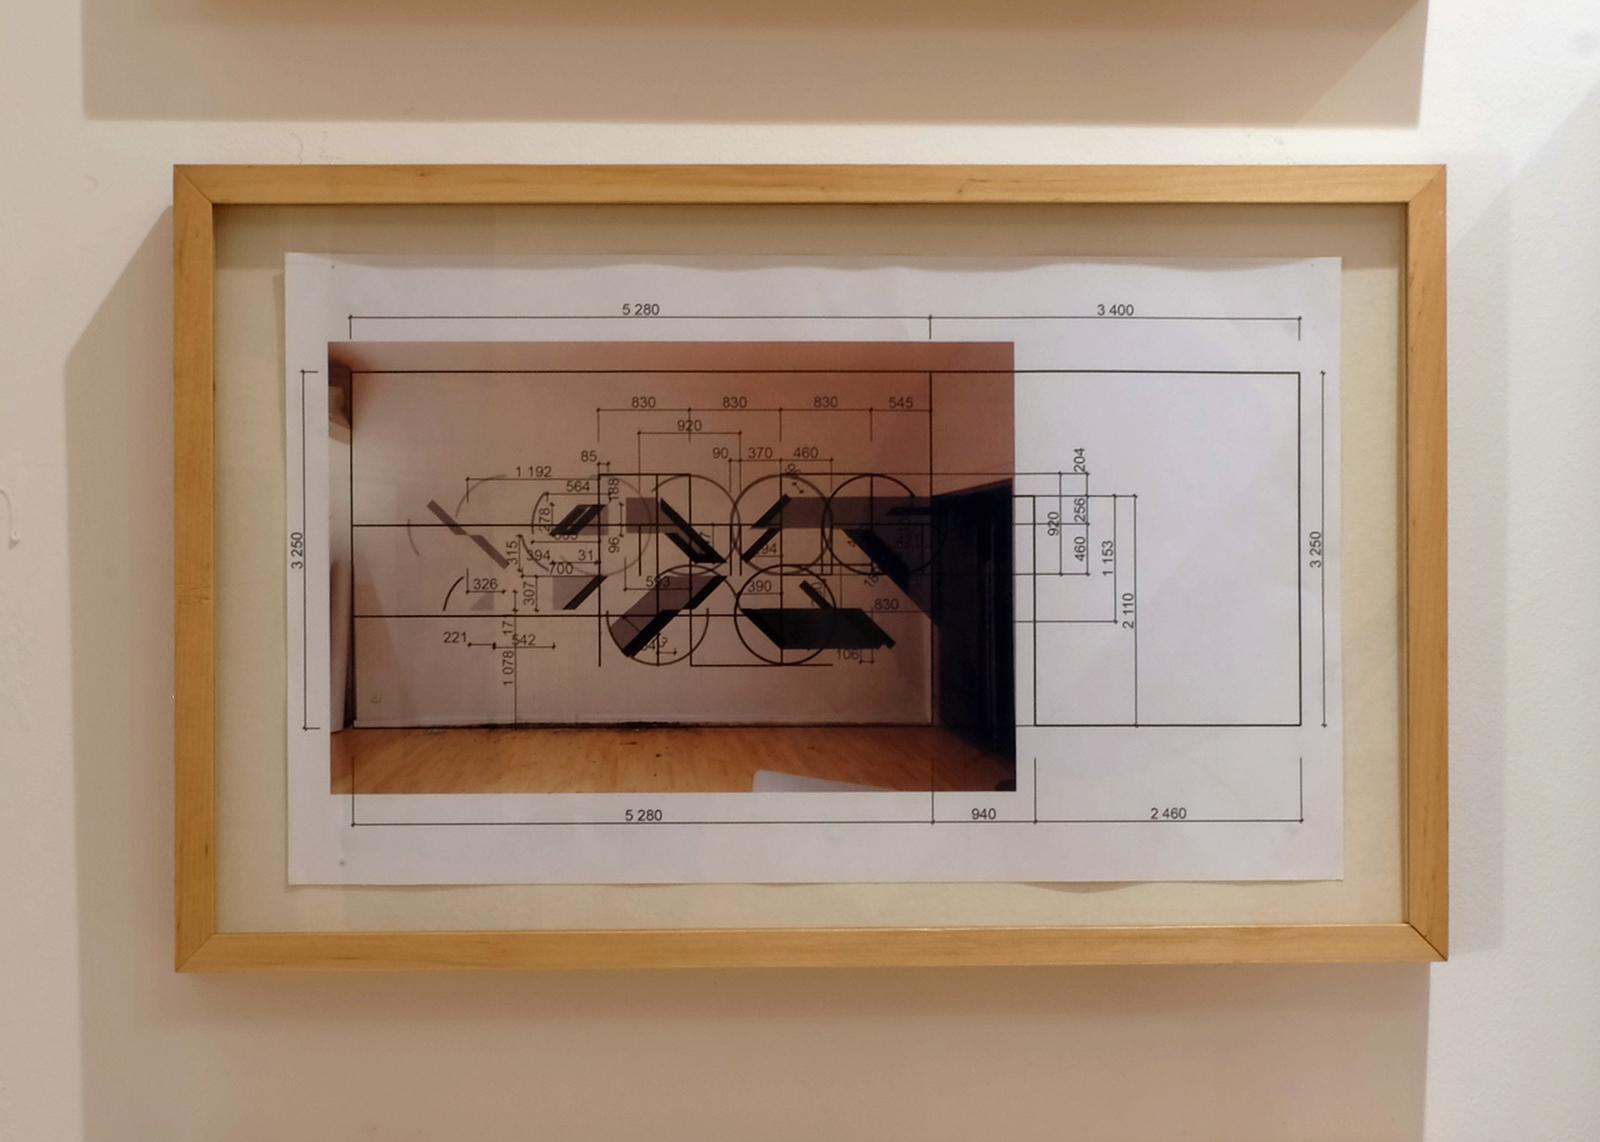 rusin-blazej-serhii-torbinov-peace-project-02